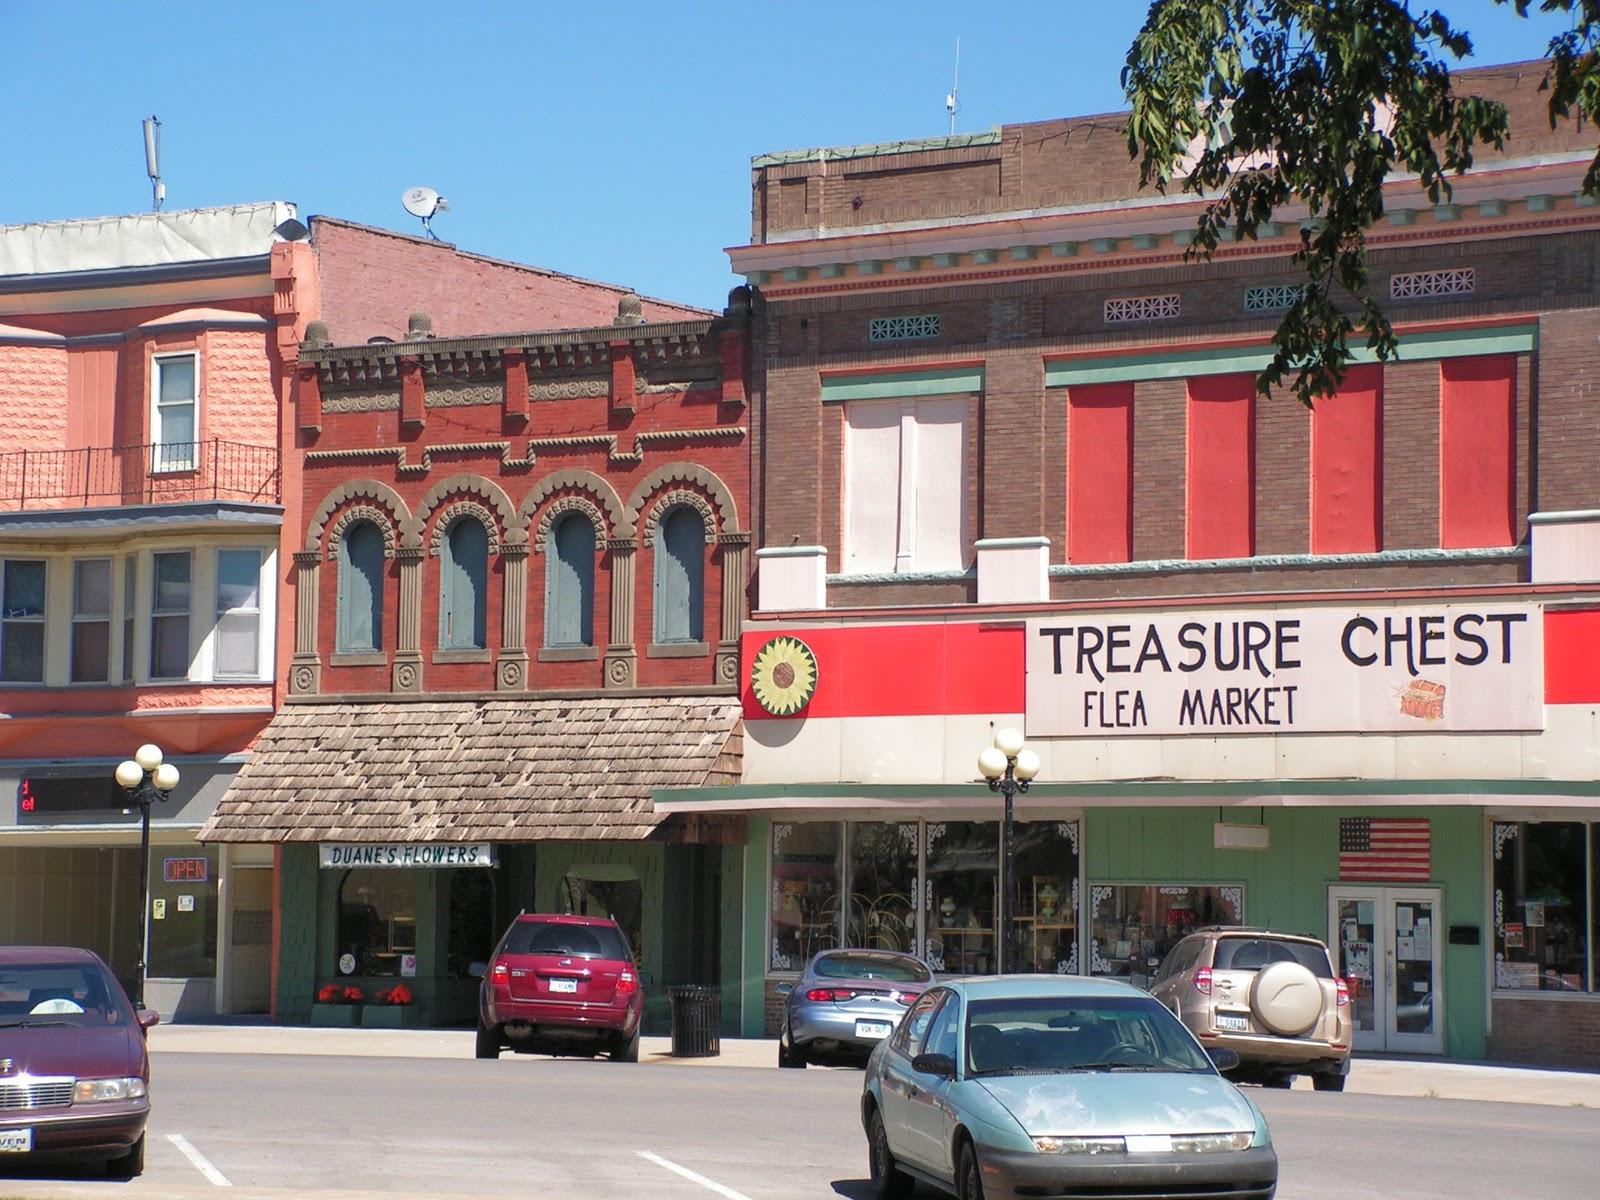 Iola (KS) United States  City pictures : town videos pictures of iola town rural kansas tourism iola